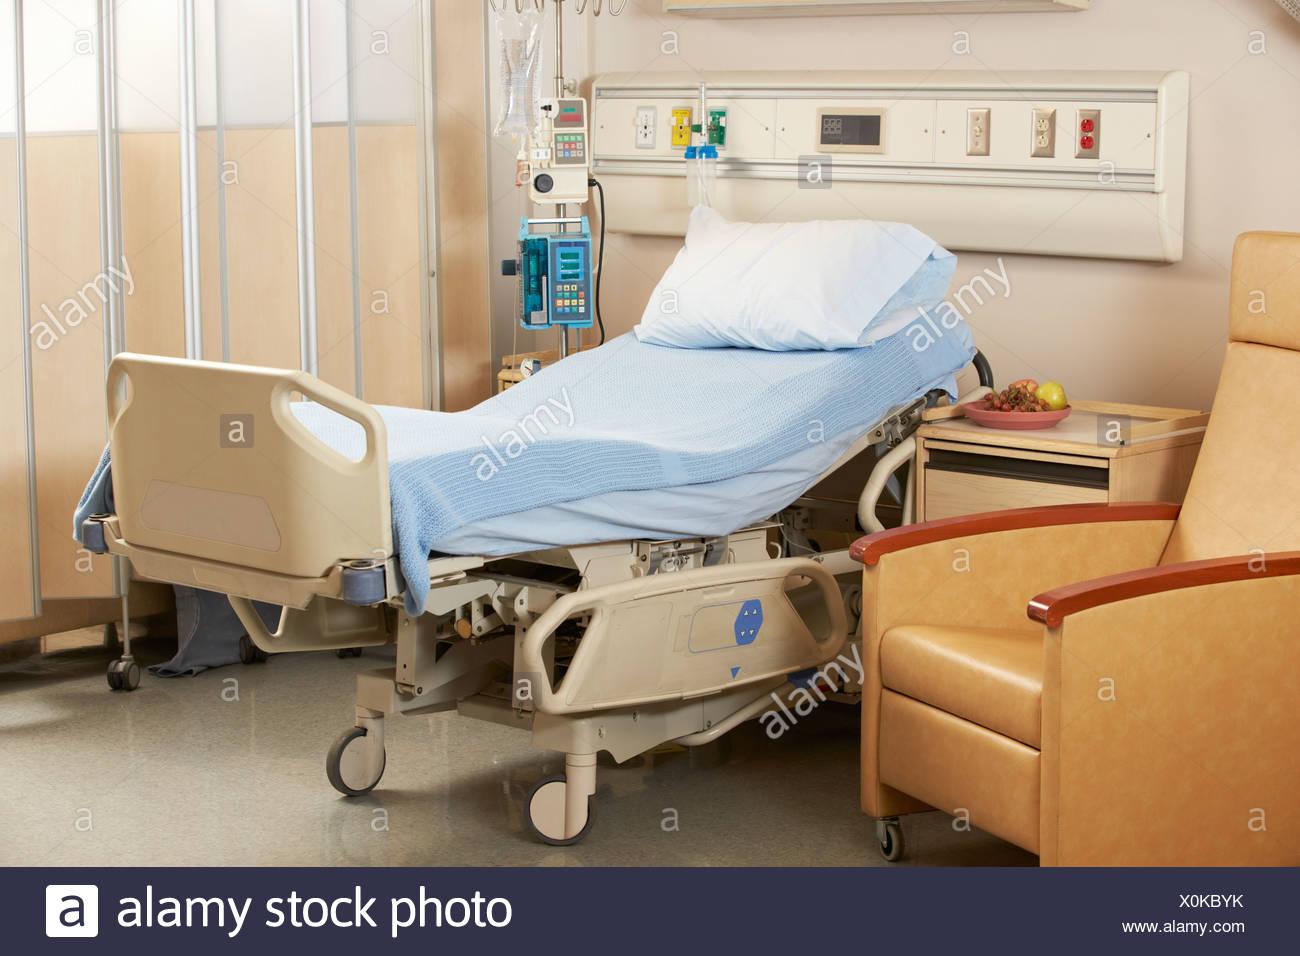 Empty Bed On Hospital Ward - Stock Image